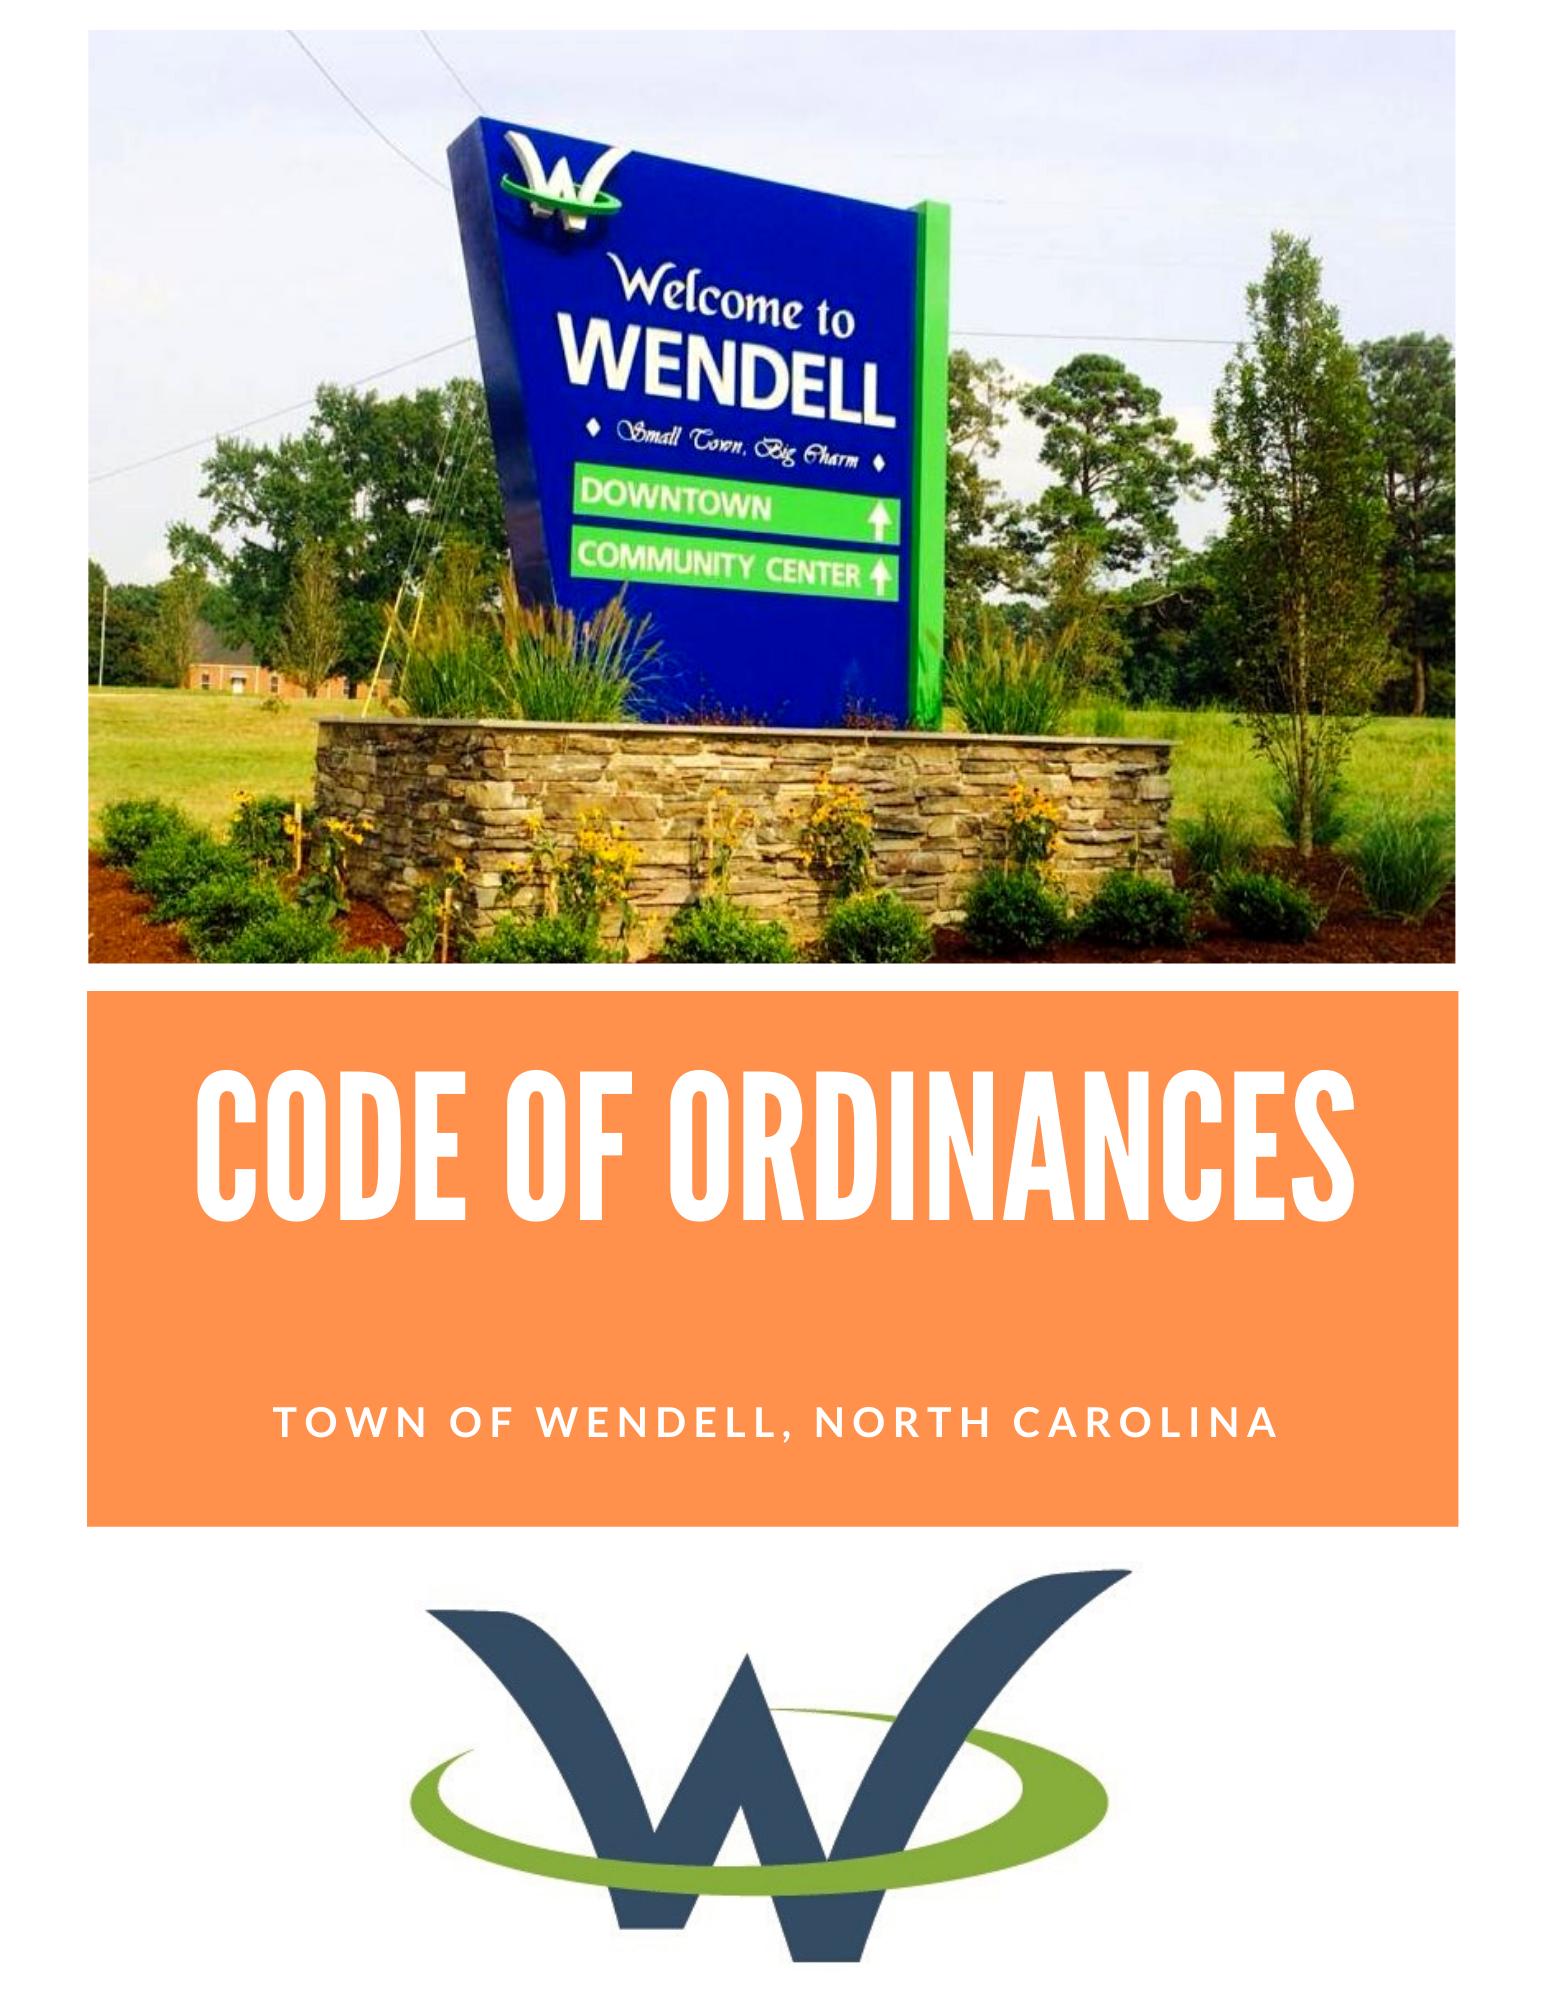 Code of Ordinances